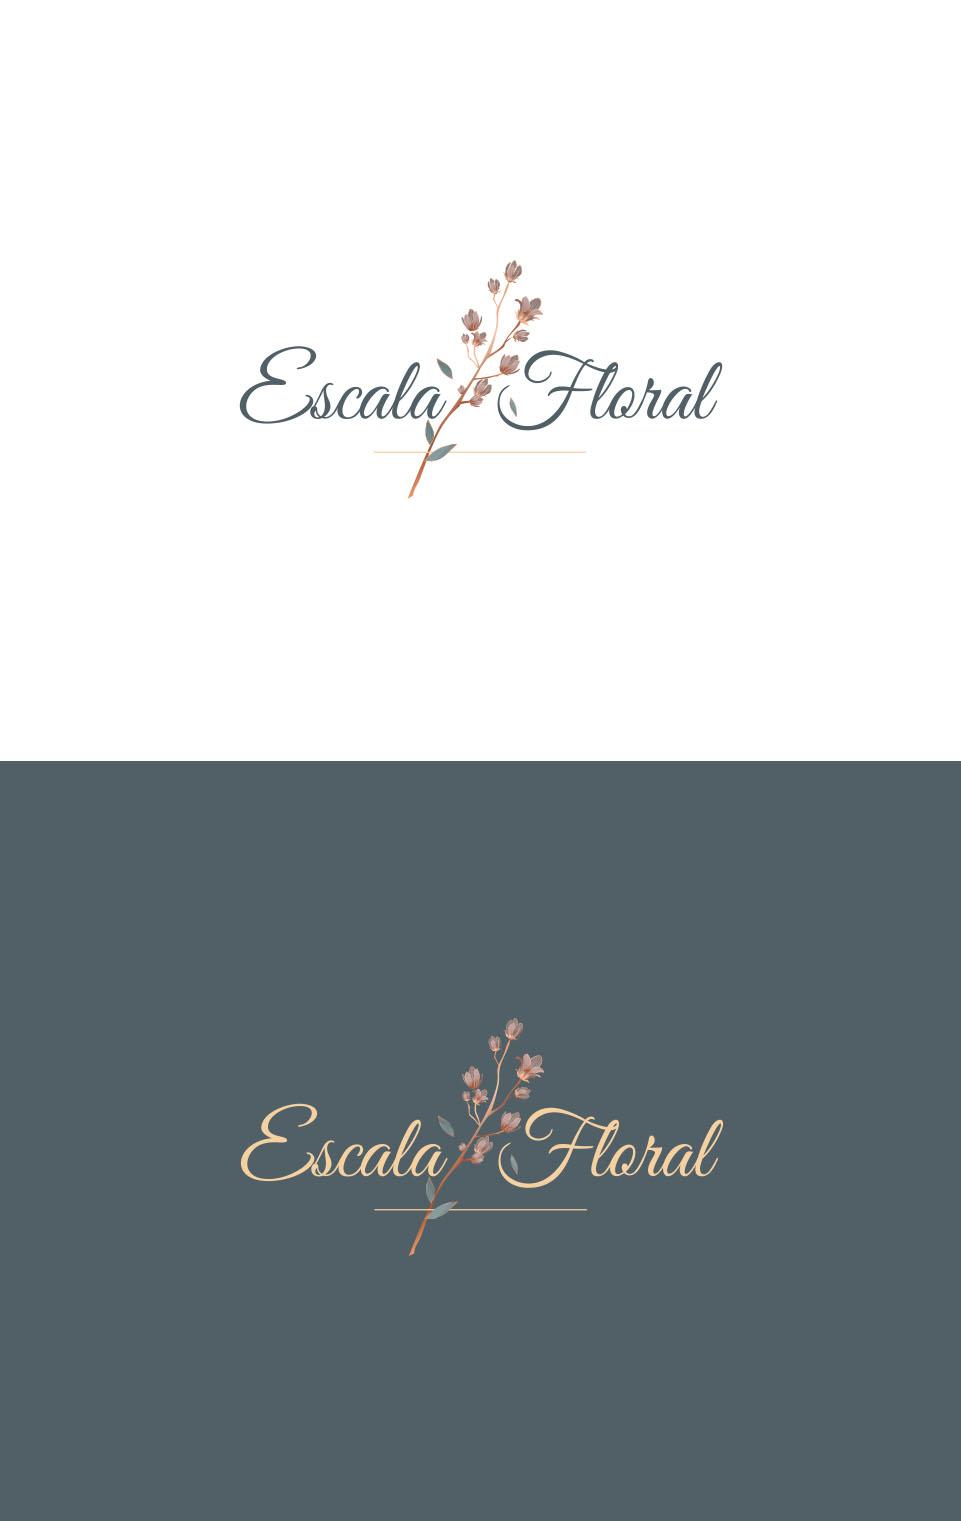 portfolio_escalaflorals_logo-02